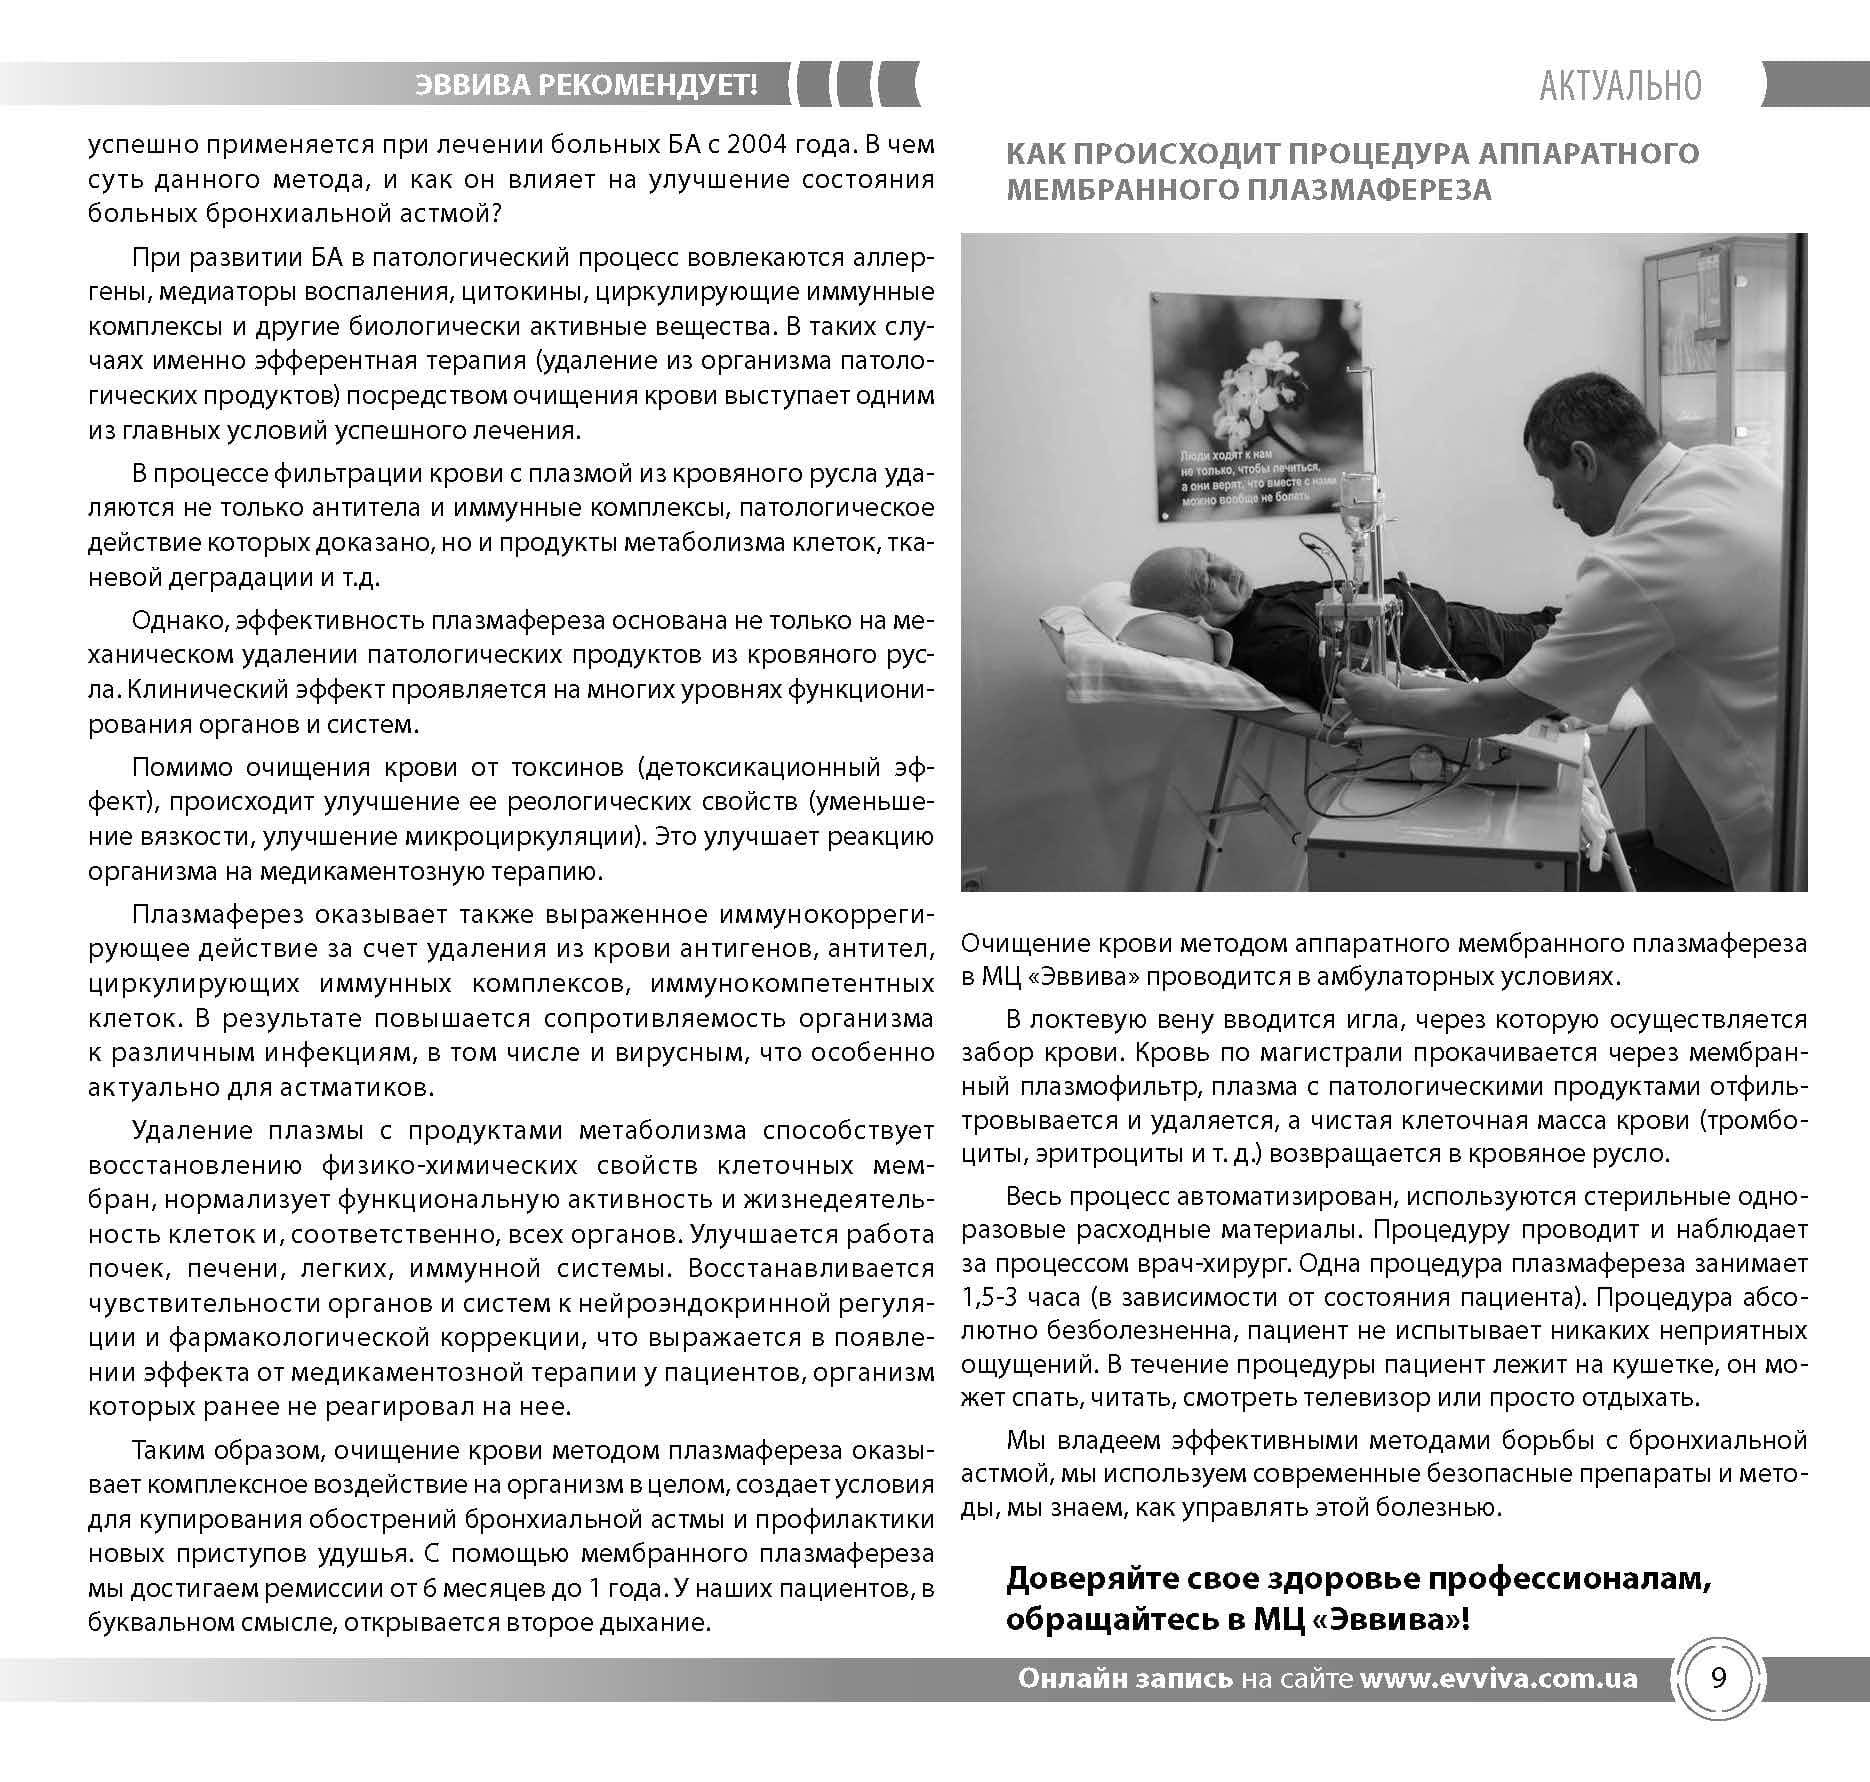 evviva-zhurnal-119-page9